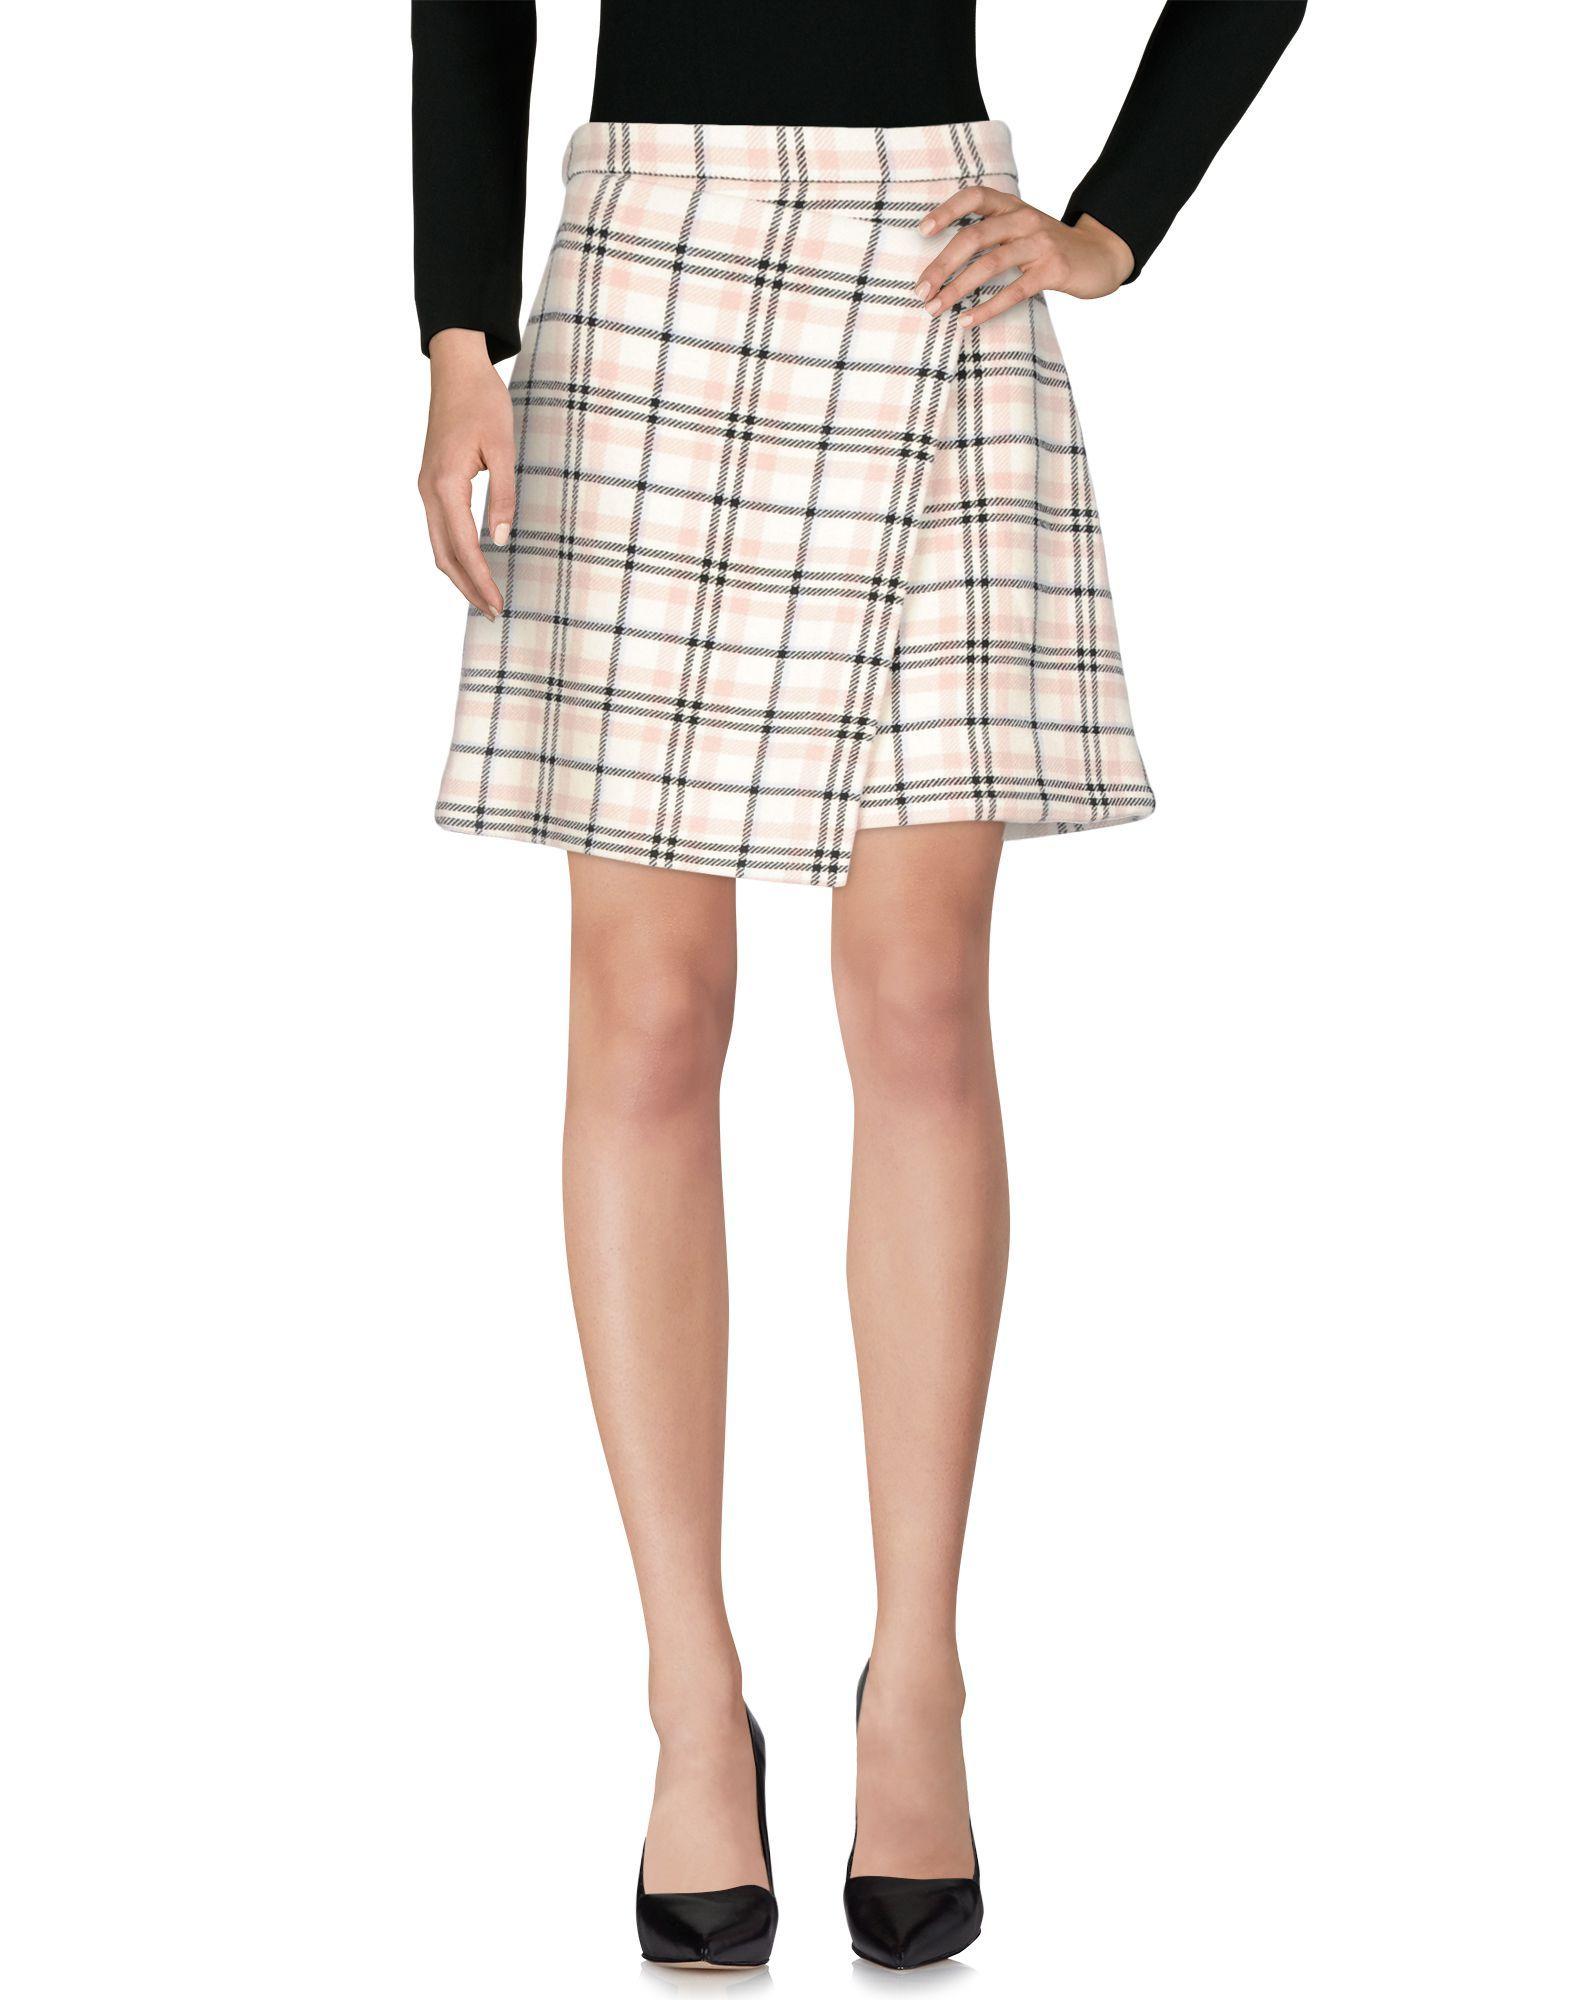 Carven Pastel Pink Plaid Wool Skirt